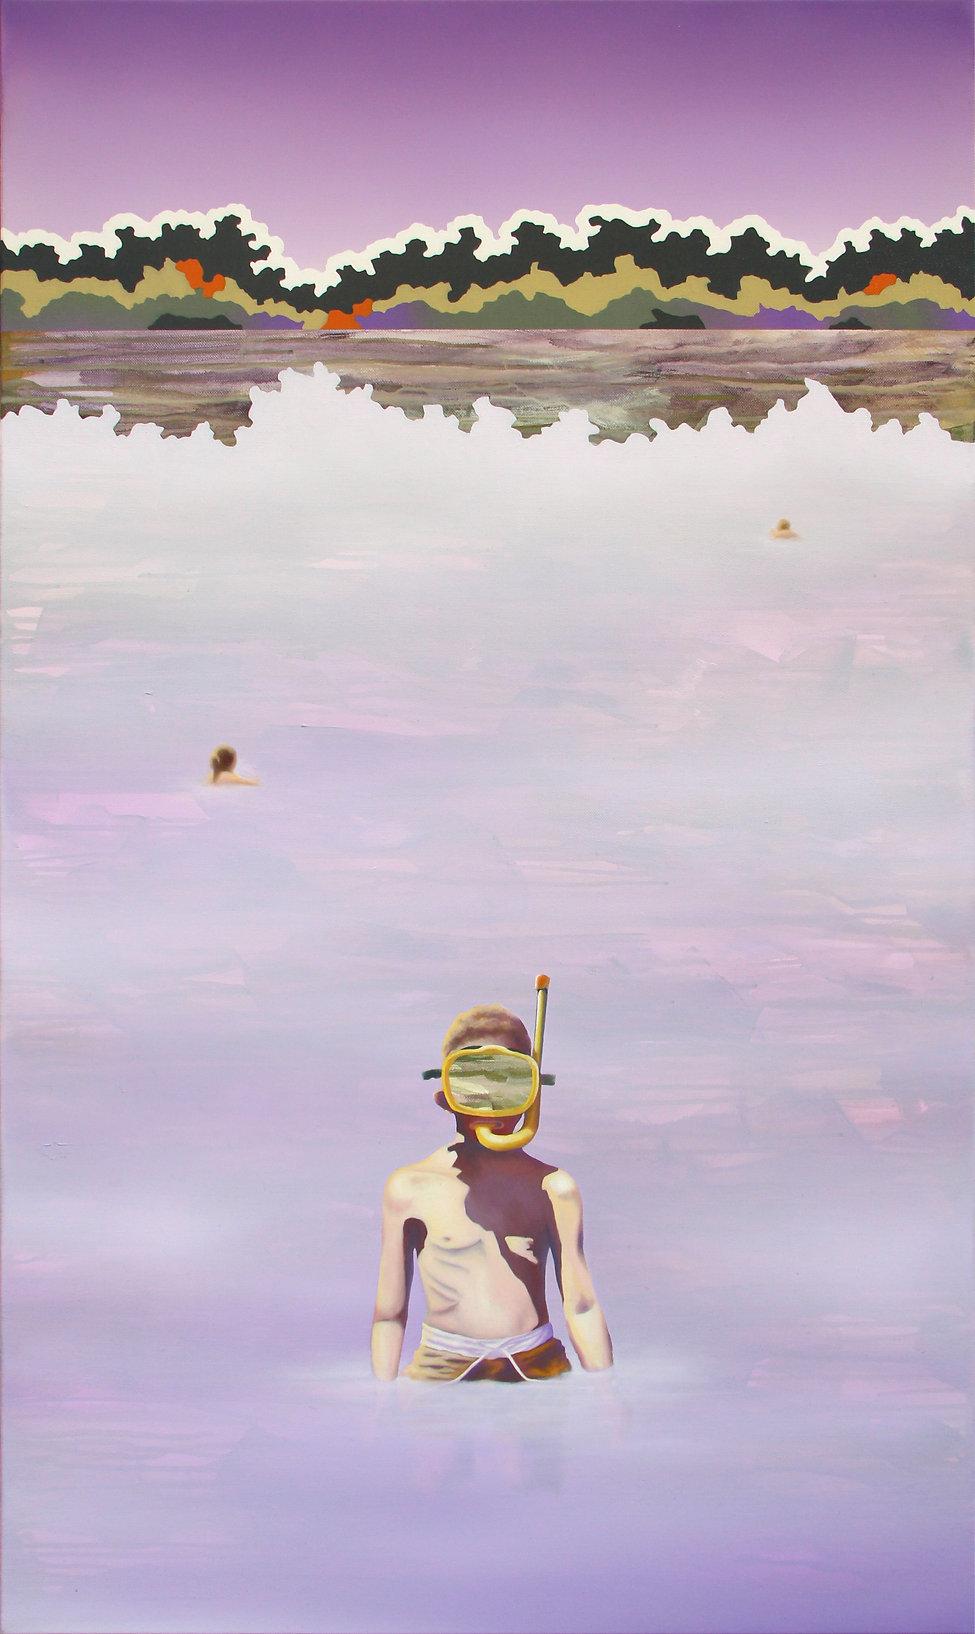 L'épreuve_acrylic and oil painting on canvas_70x120cm_2020_Lucas Pfeiffer